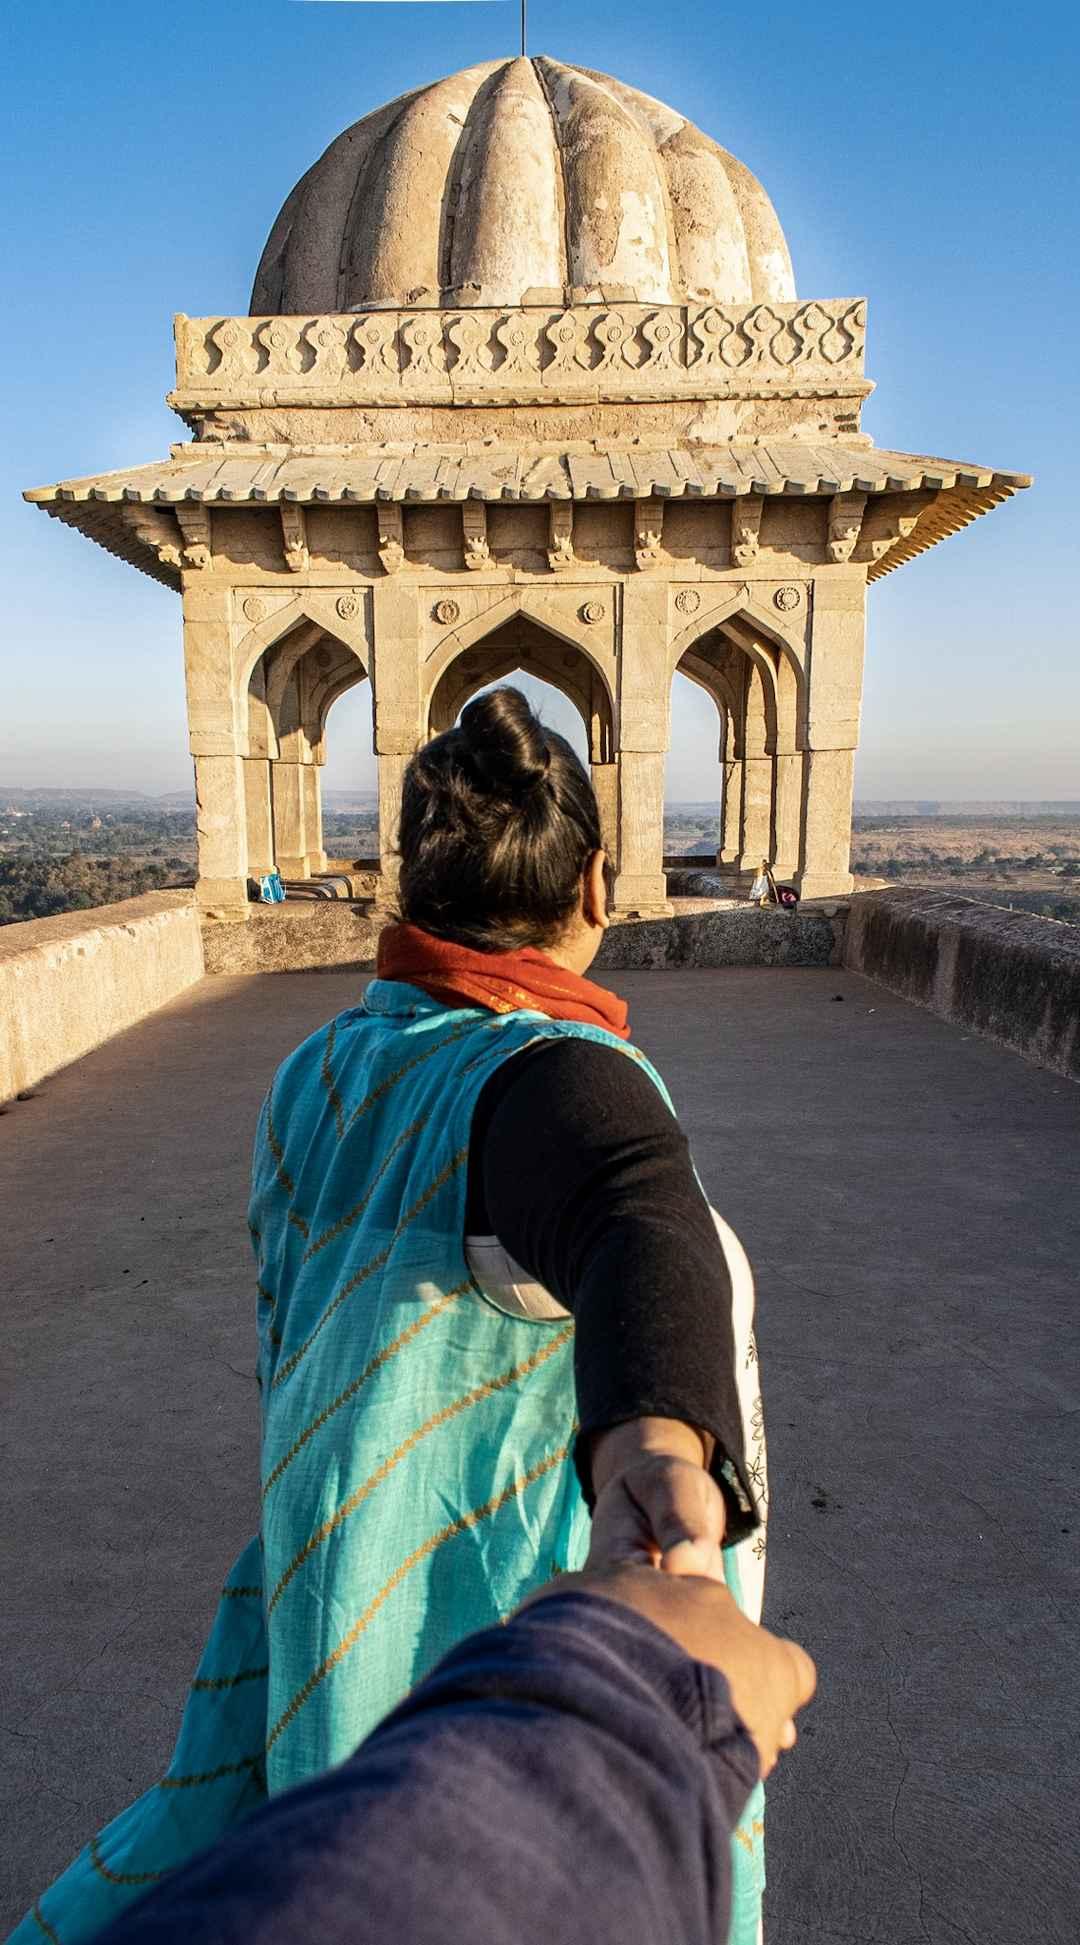 #Followmeto the Medieval Metropolis of Malwa - Mandu #TripotoCommunity #SelfieWithAView